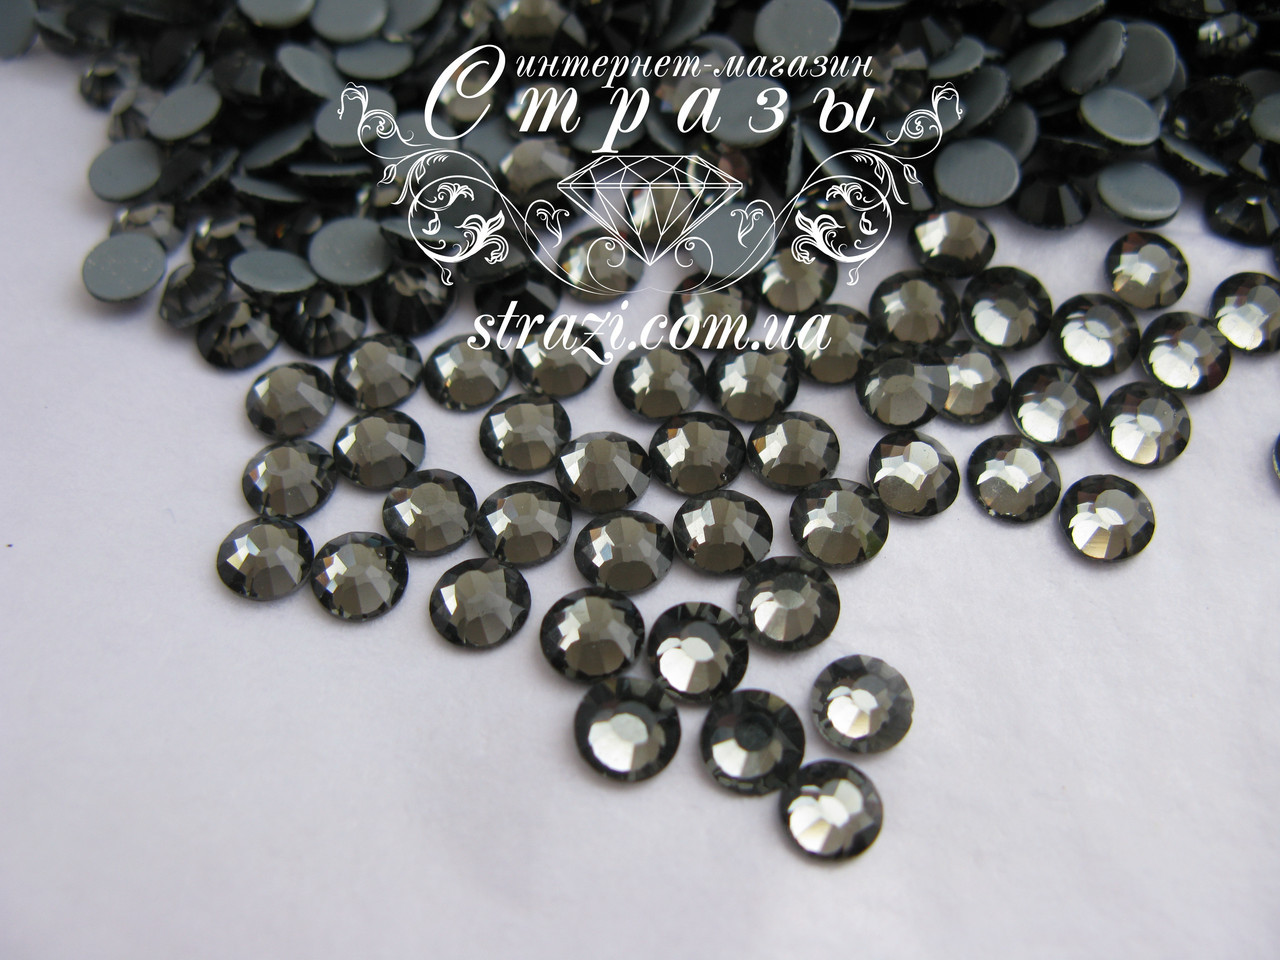 Термо стразы Lux ss16 Black Diamond (4.0mm) 1440шт